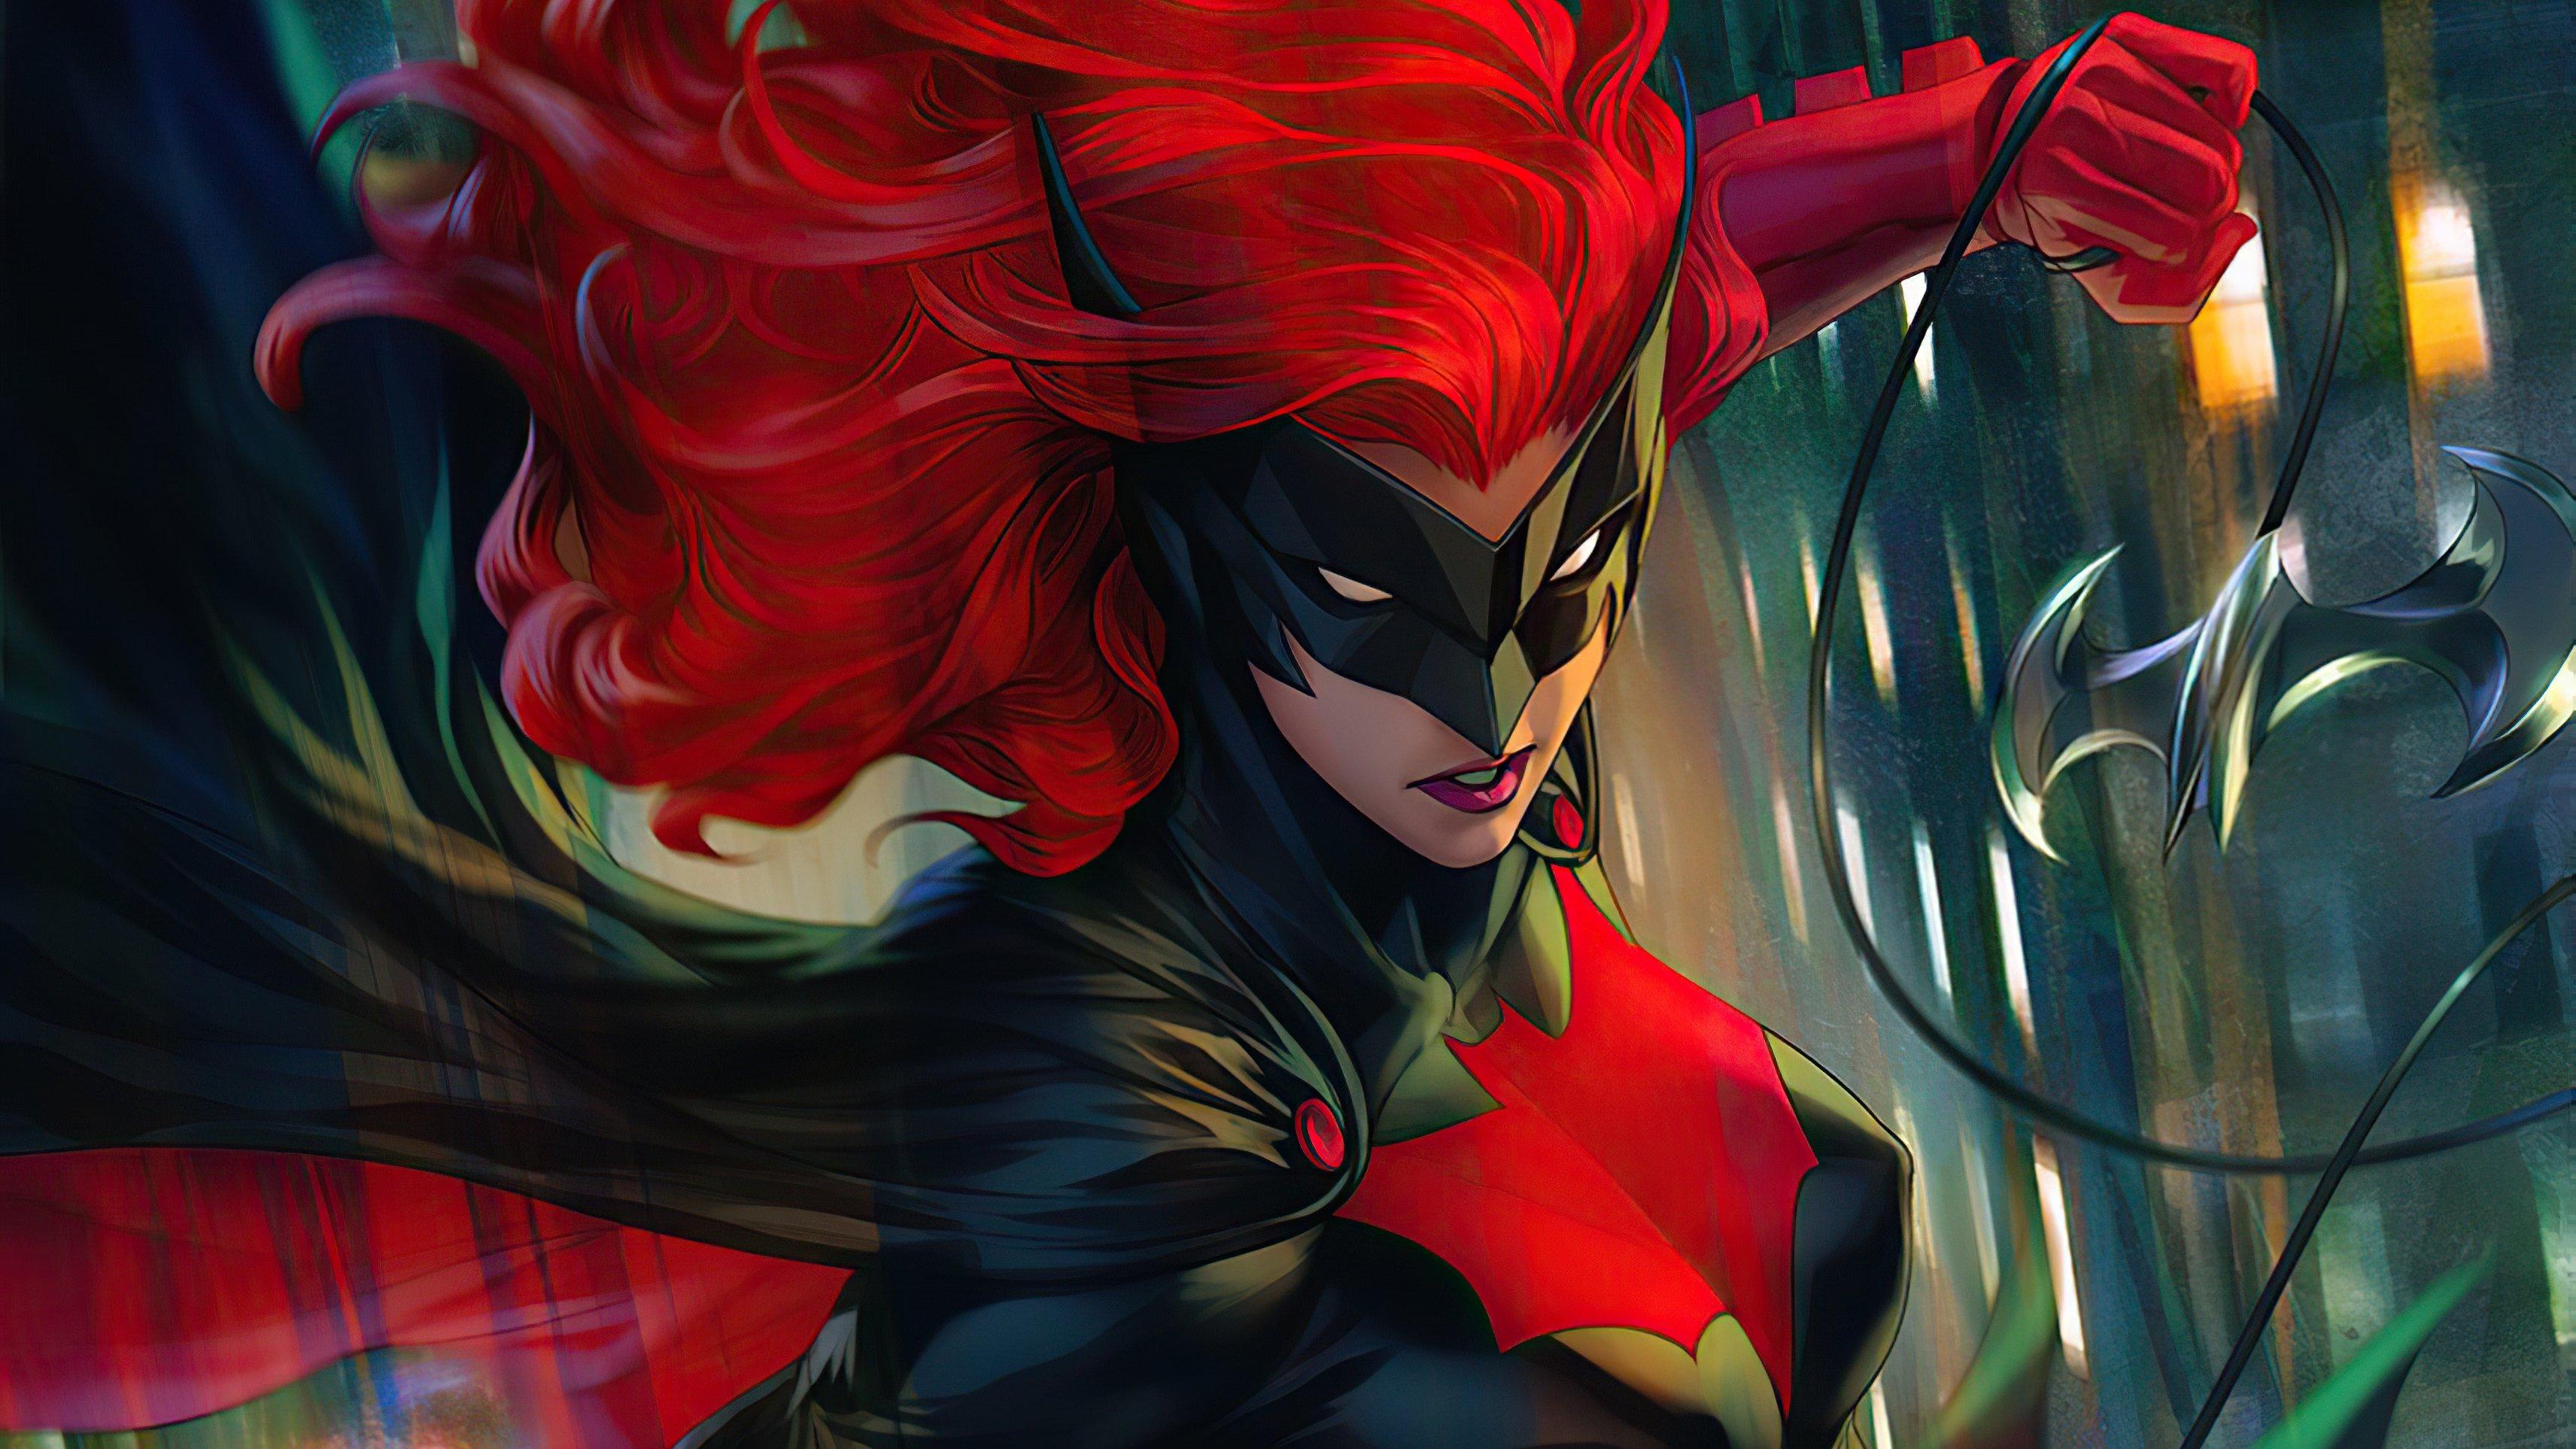 Wallpaper Batwoman Fanart 2020